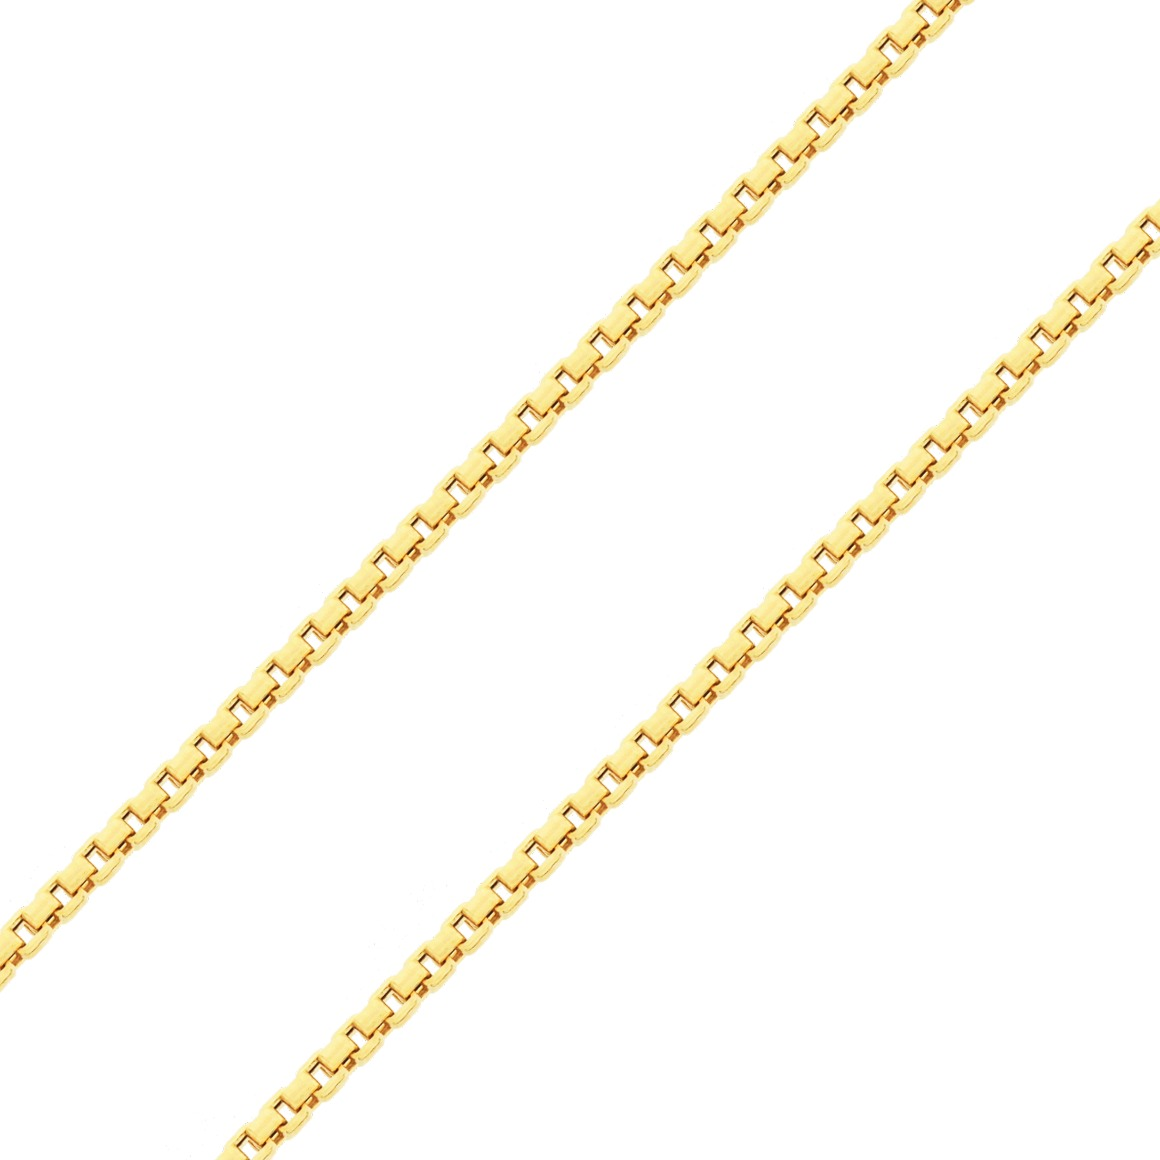 6b39874812a71 corrente de ouro 18k masculina - feminina - veneziana 2mm. Carregando zoom.